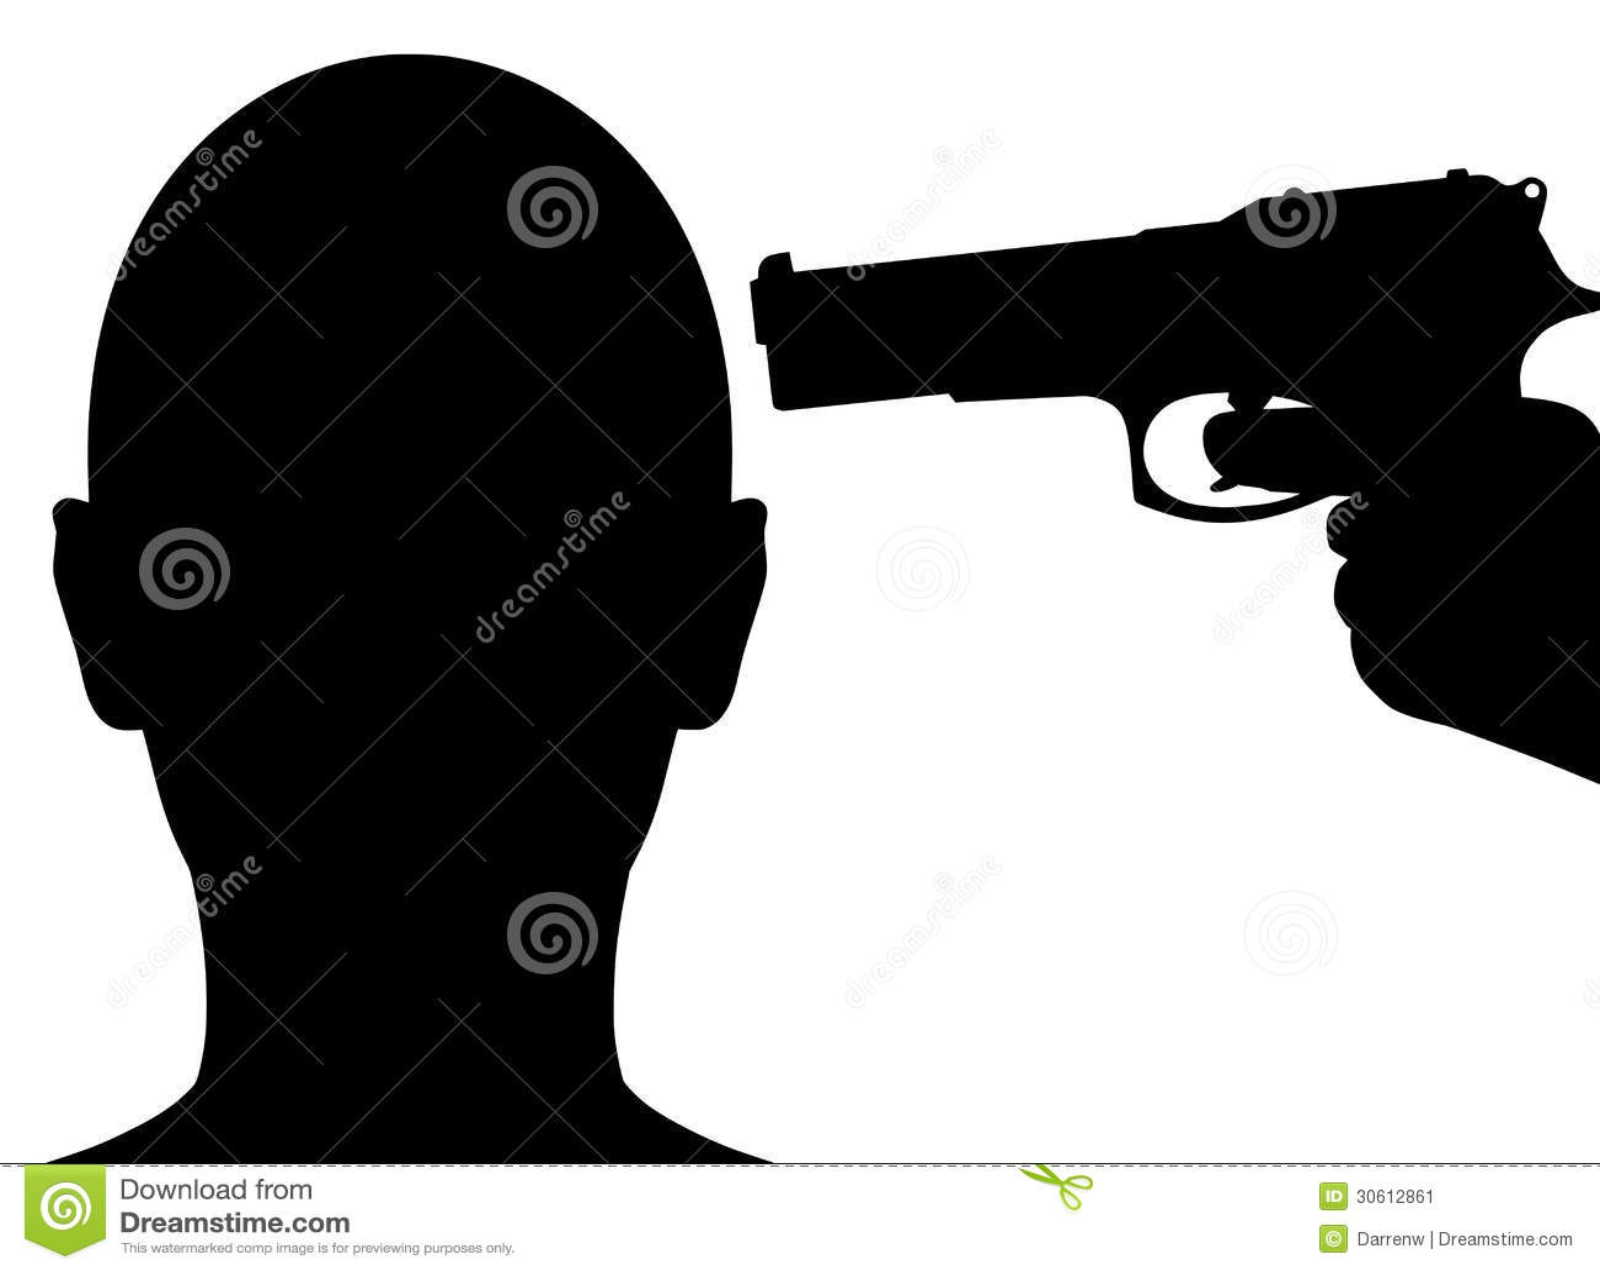 Gun Pointing To Head Stock Image - Image: 30612861